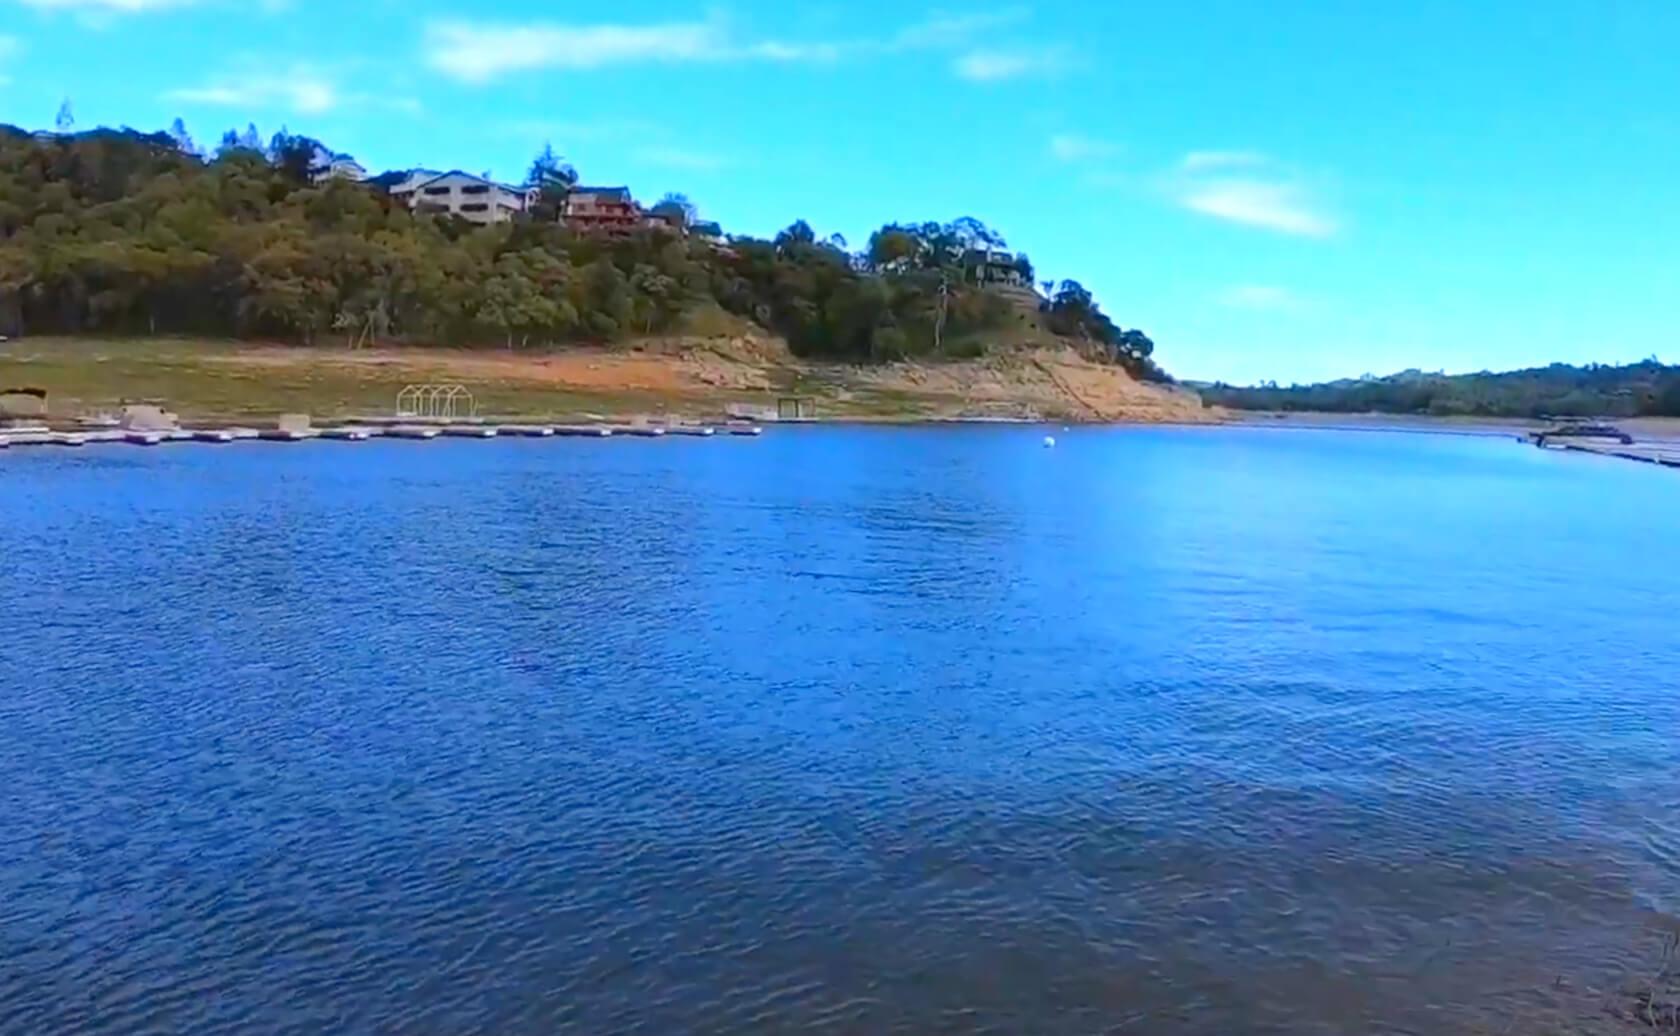 Nacimiento-Lake-Fishing-Guide-Report-California-03